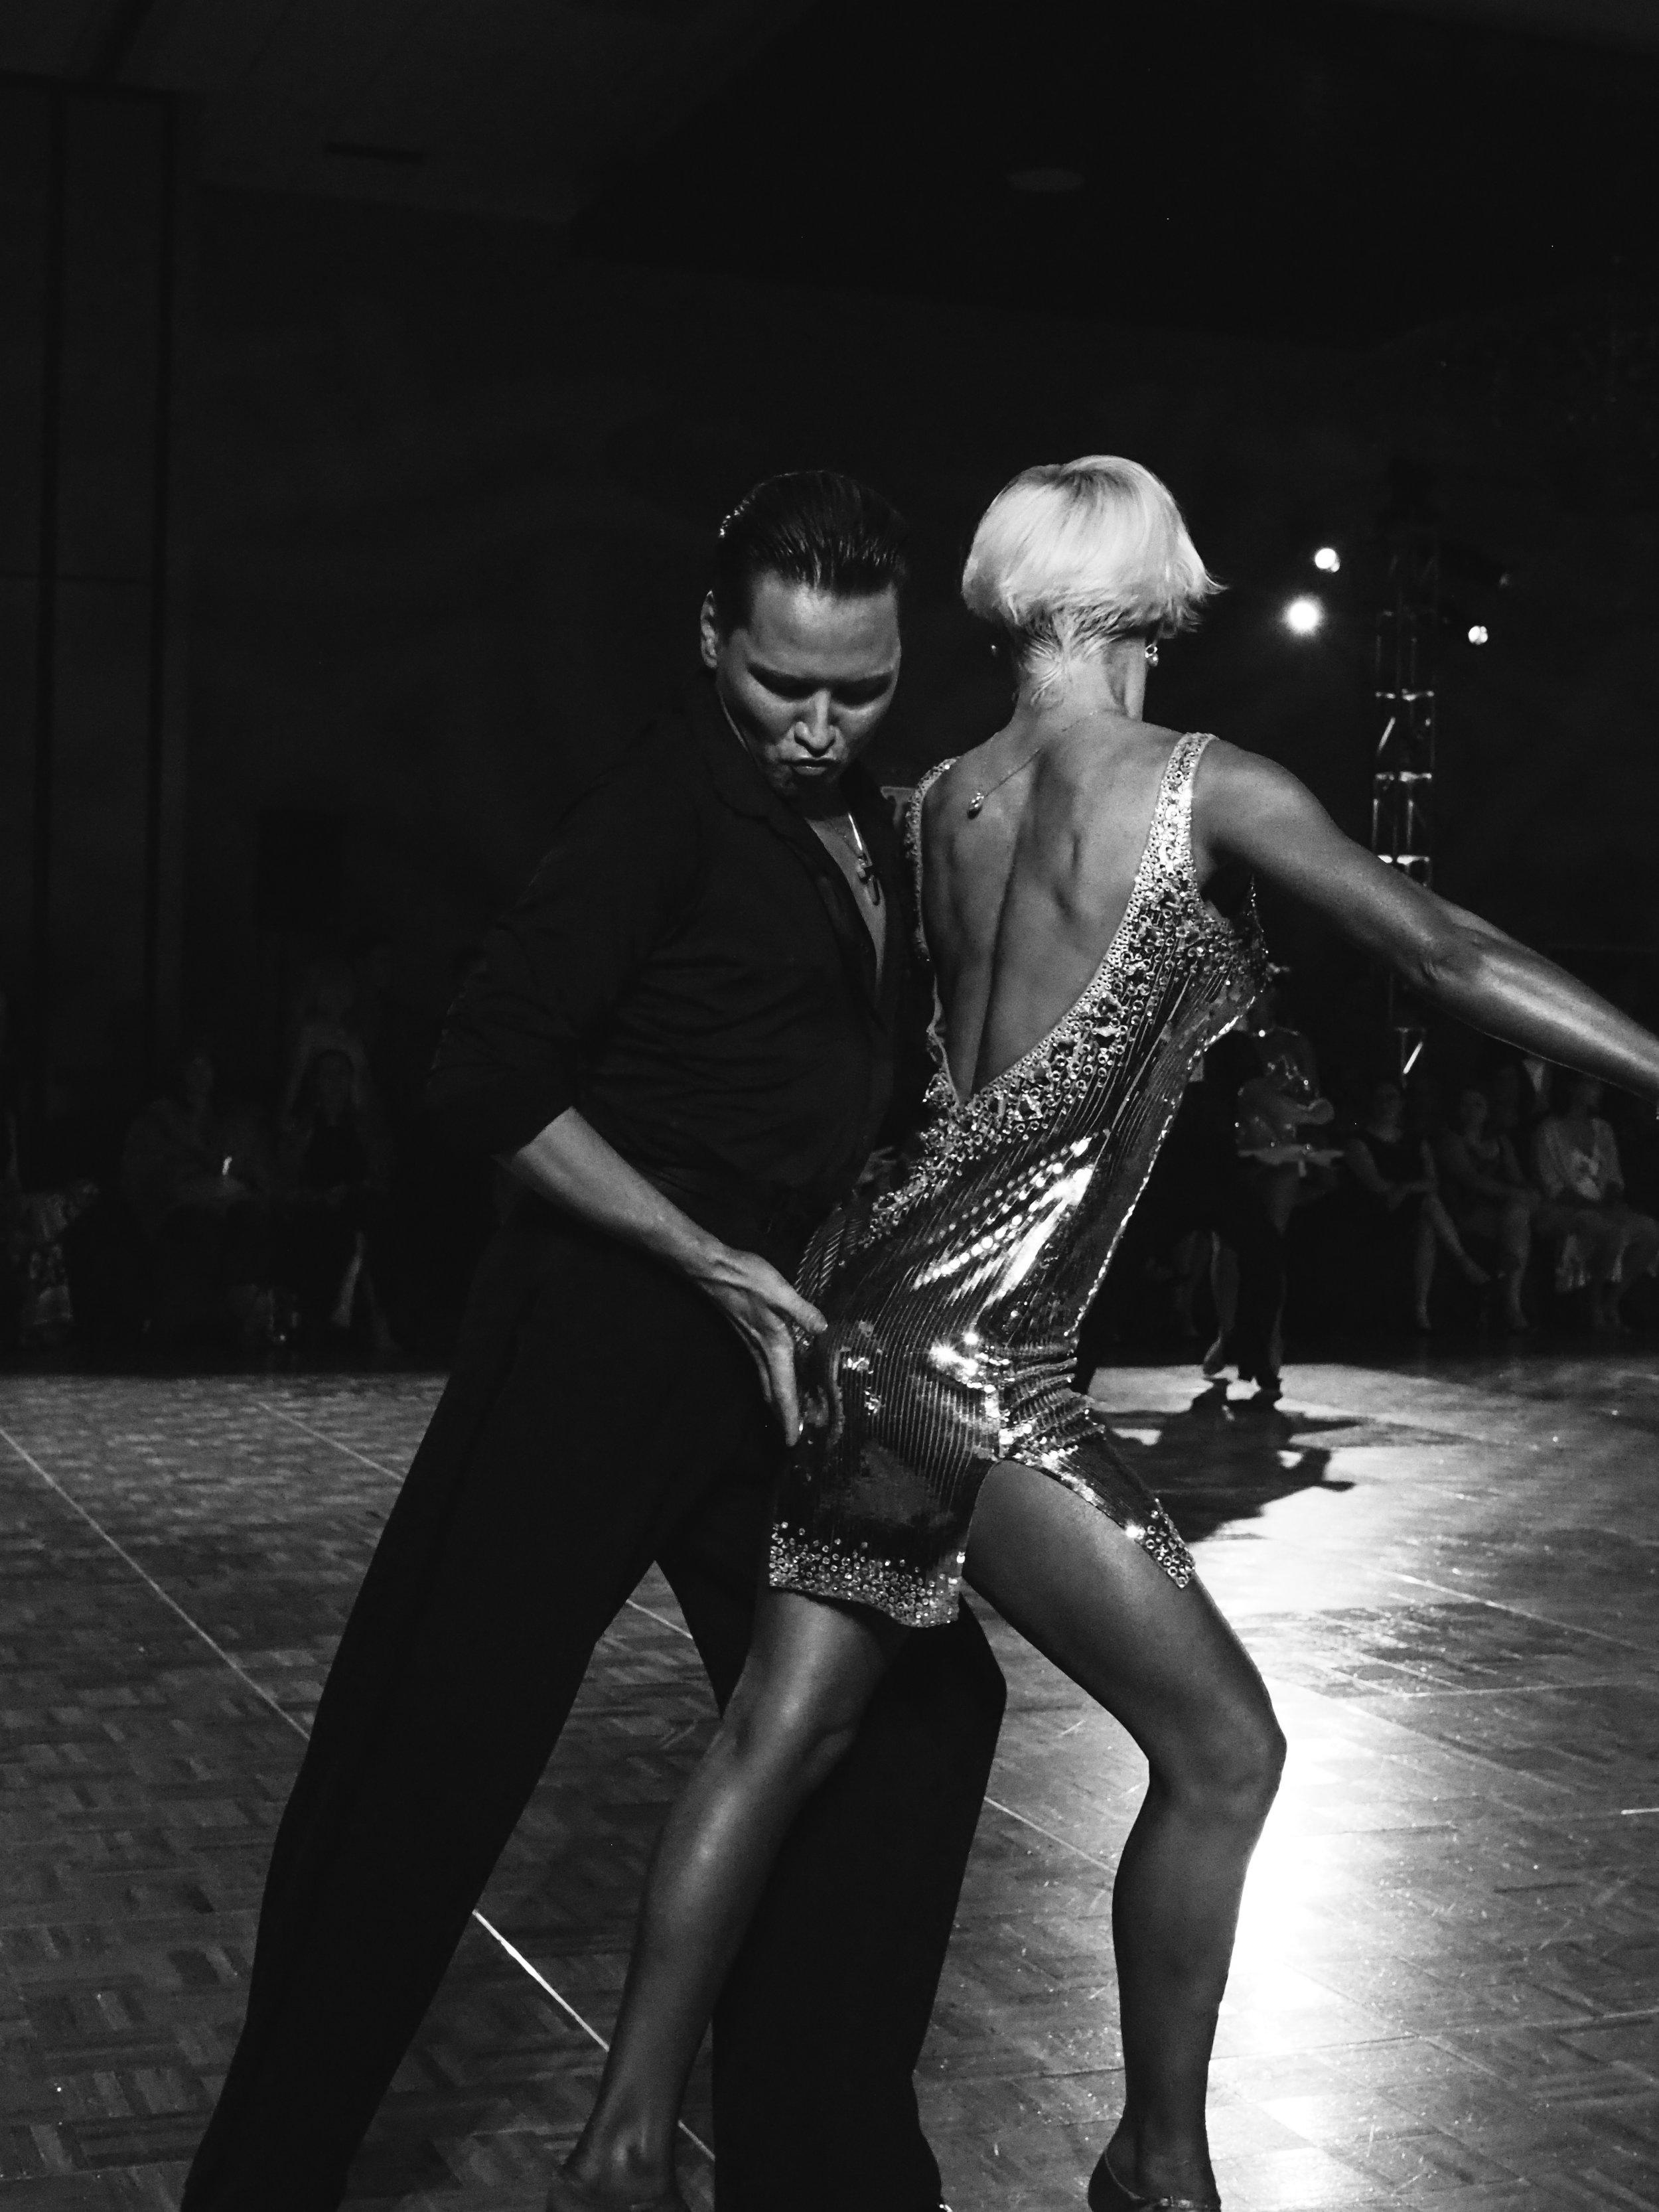 Ballroom competition. Minneapolis, MN. 2018.